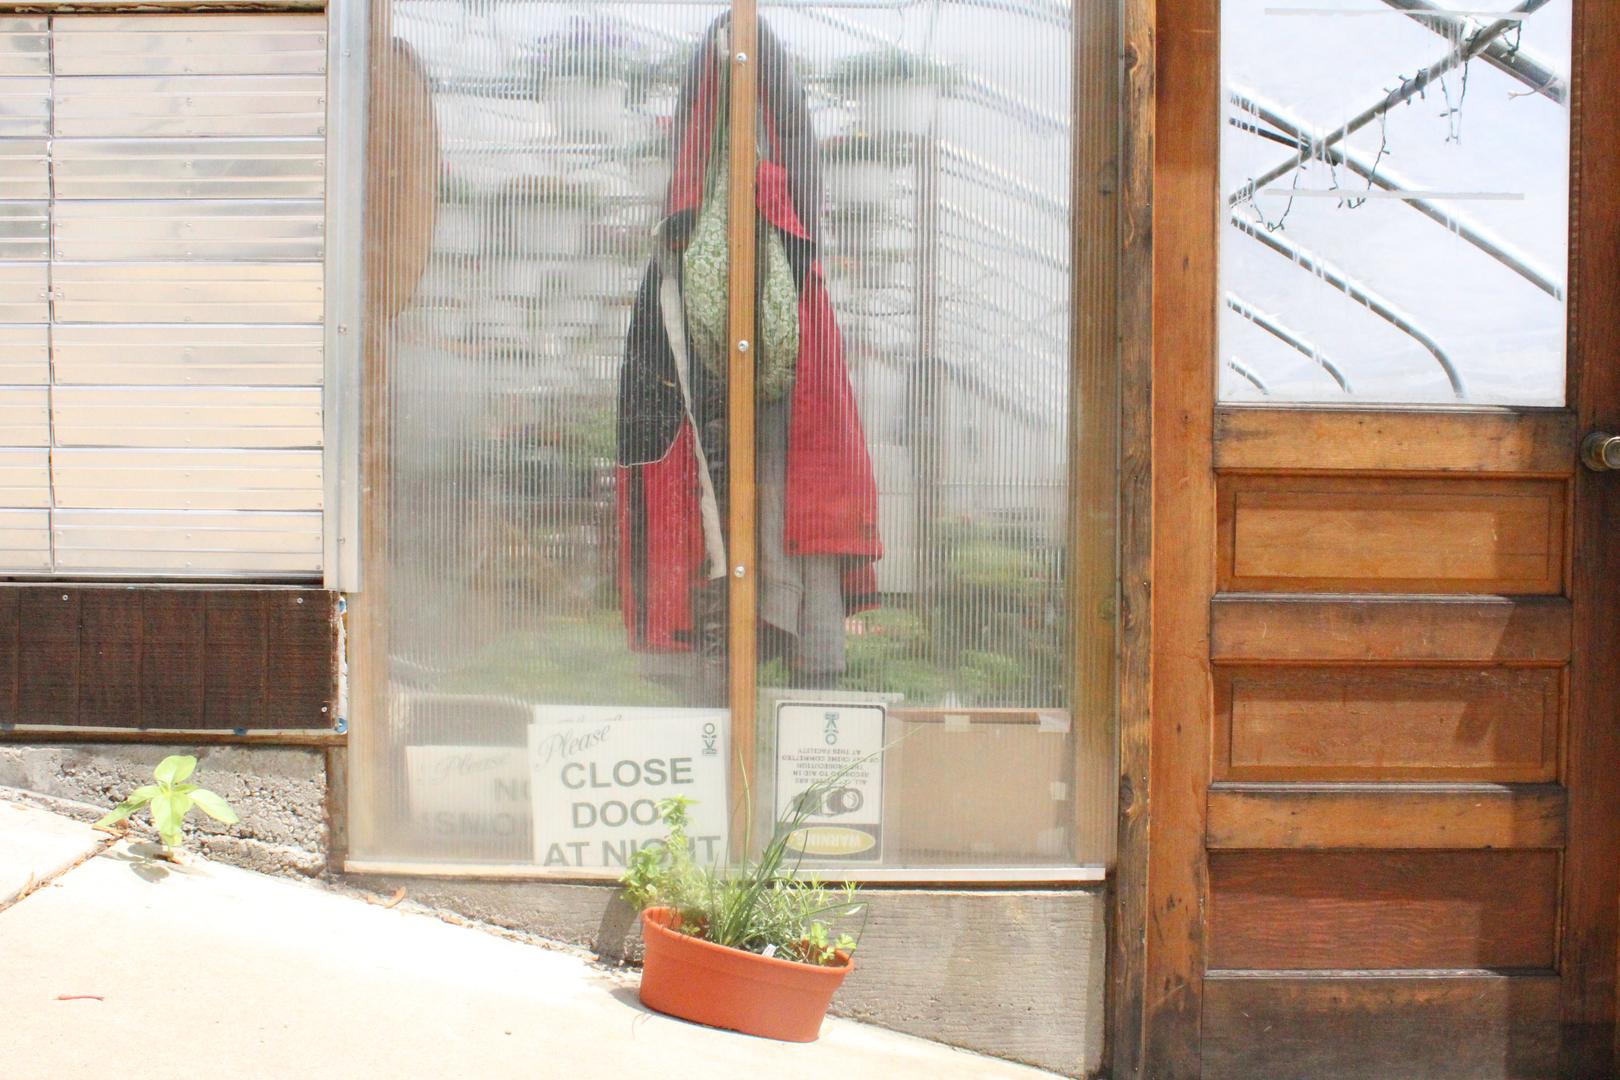 14th Street Greenhouse on